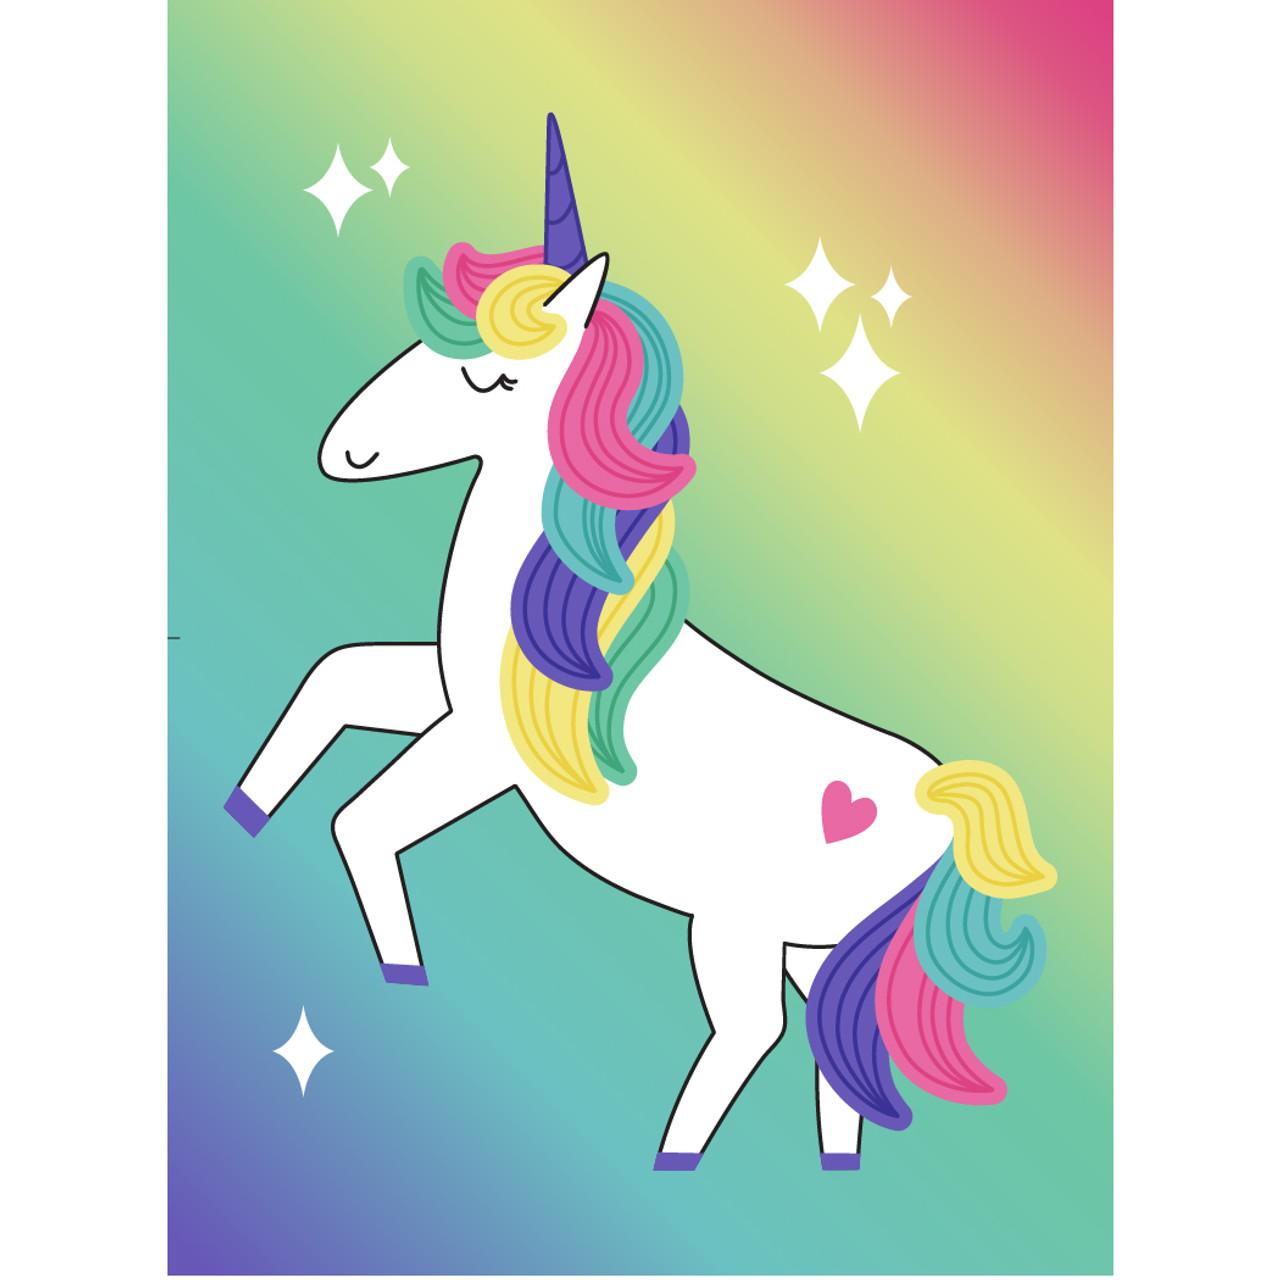 image regarding Pin the Horn on the Unicorn Printable identify Pin the Horn upon the Unicorn Poster Activity 20\